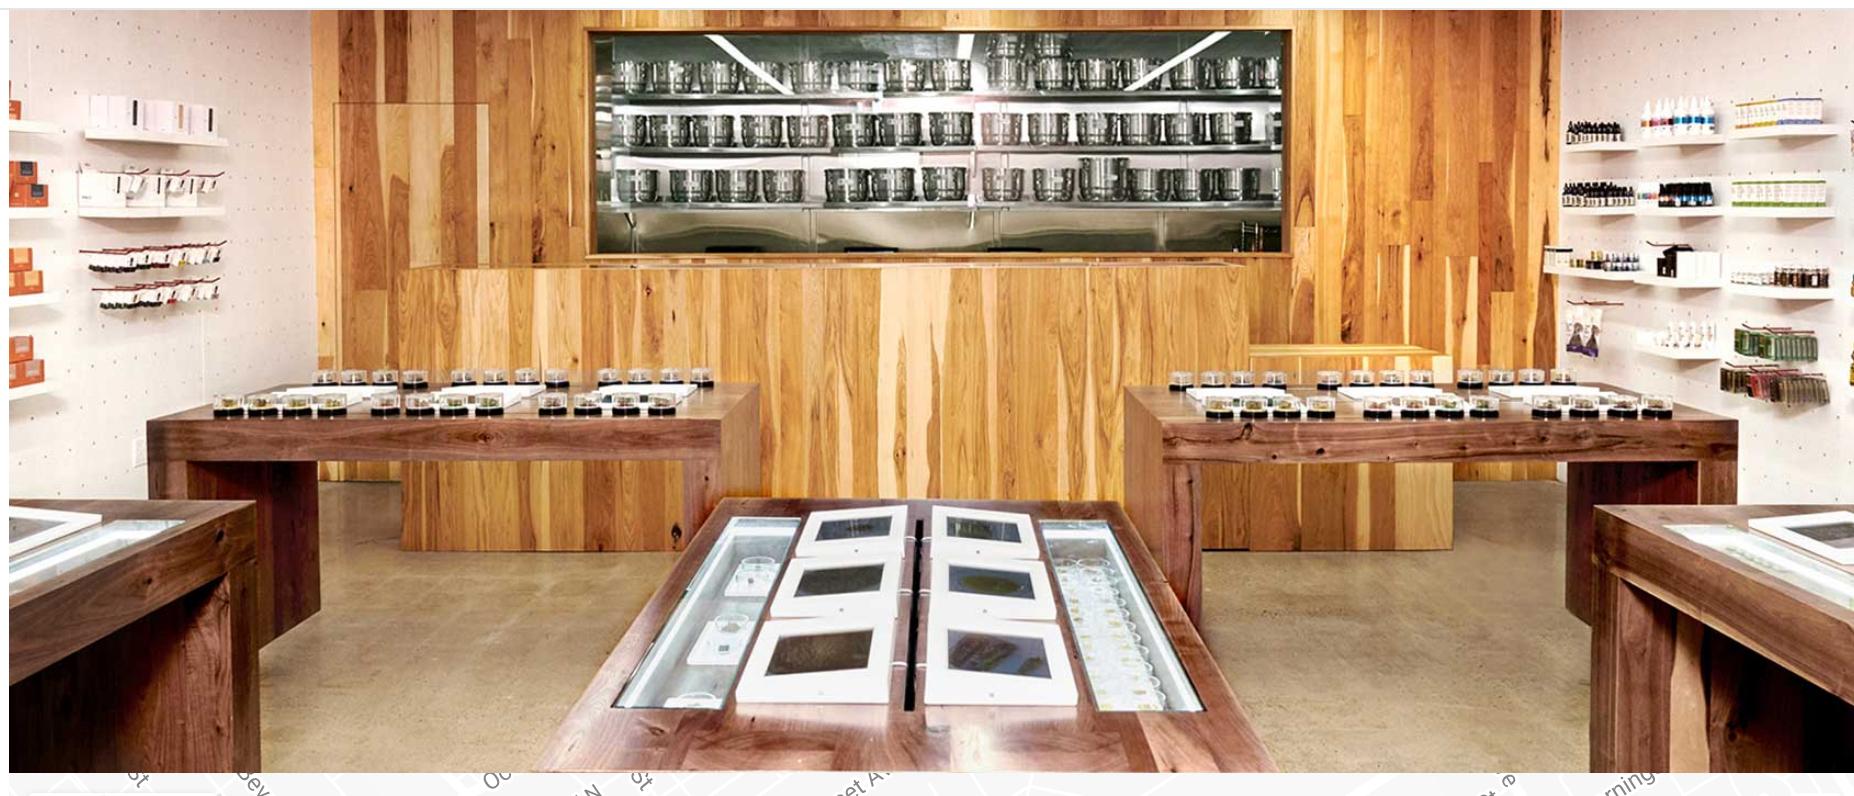 Marijuana: A Store Visit | Booze Business: A Blog Dedicated